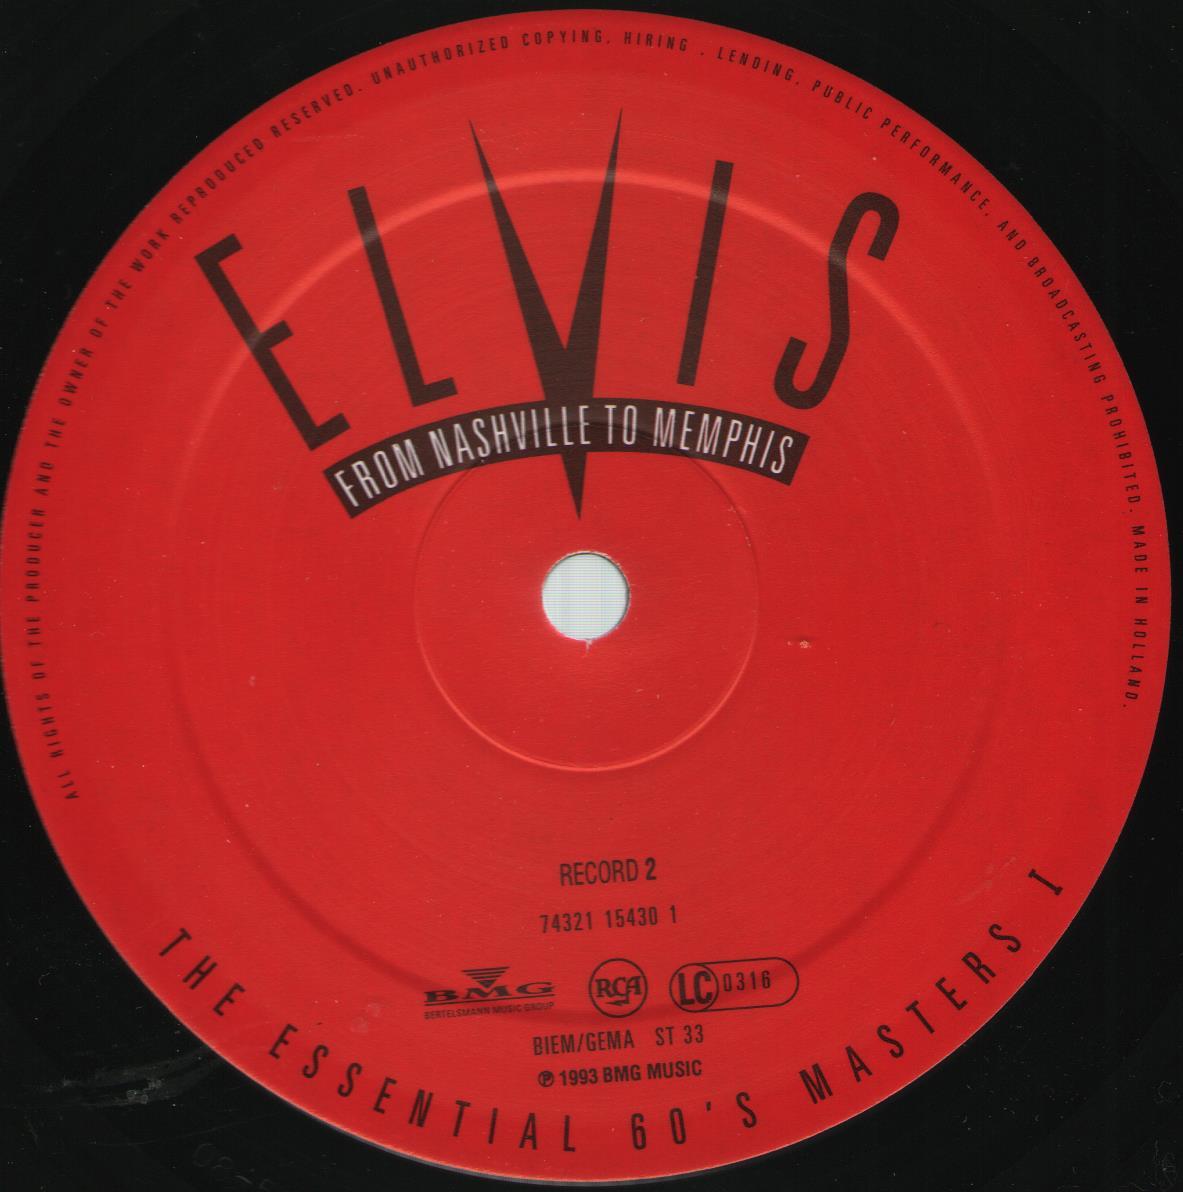 ELVIS - FROM NASHVILLE TO MEMPHIS - THE ESSENTIAL 60'S MASTERS Bild3d8j0b